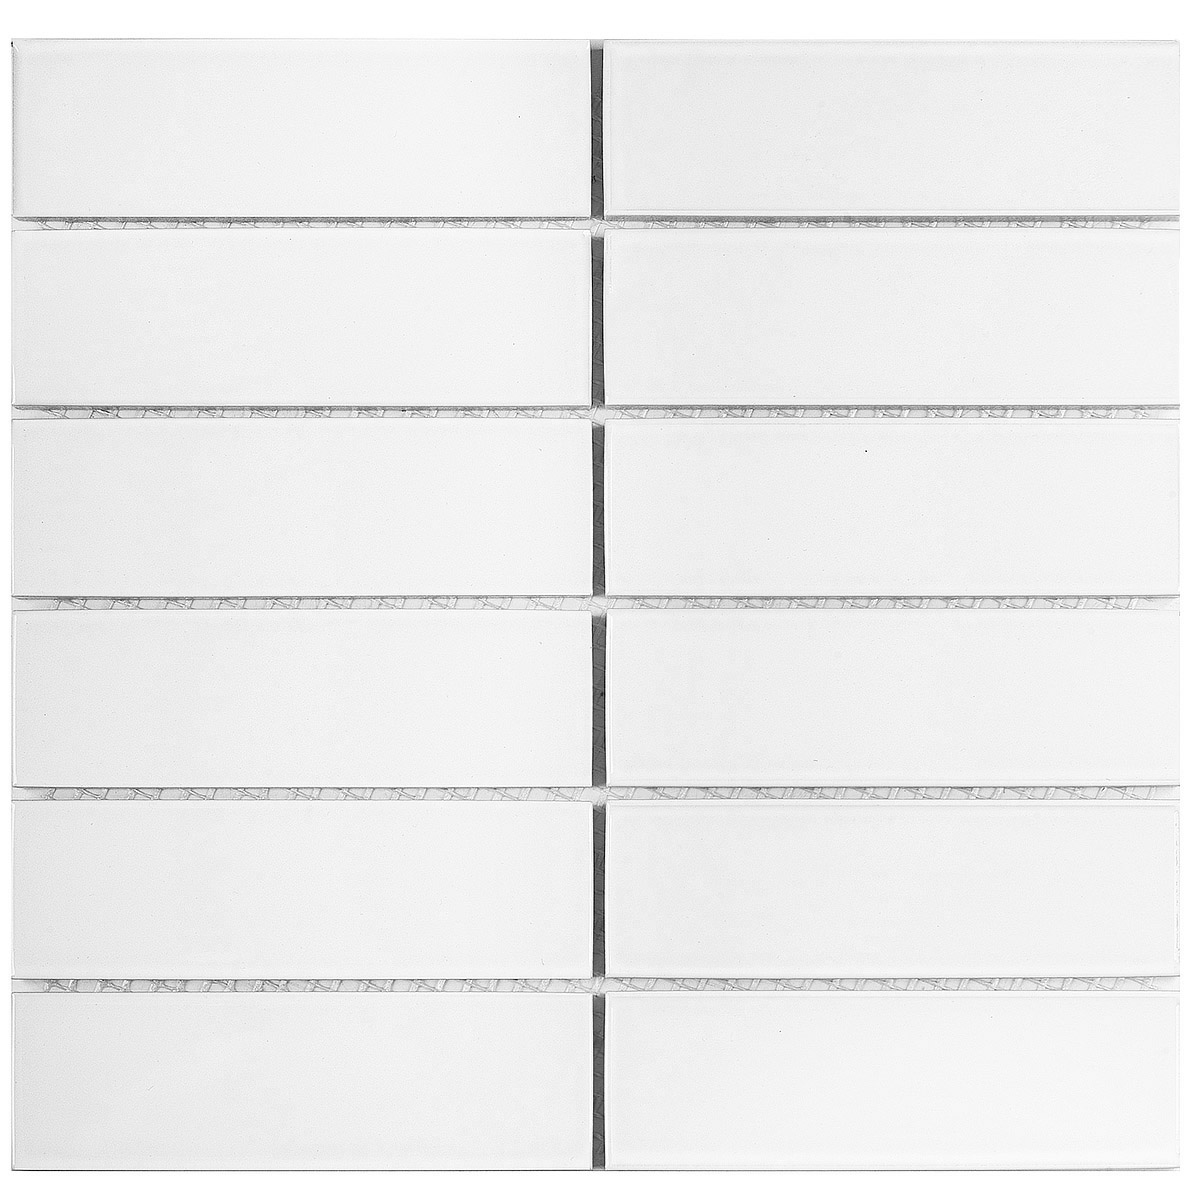 Керамическая мозаика 47x147 White Matt (V-VW56000) 300х300x6 на сетке из коллекции Brick & Metro.